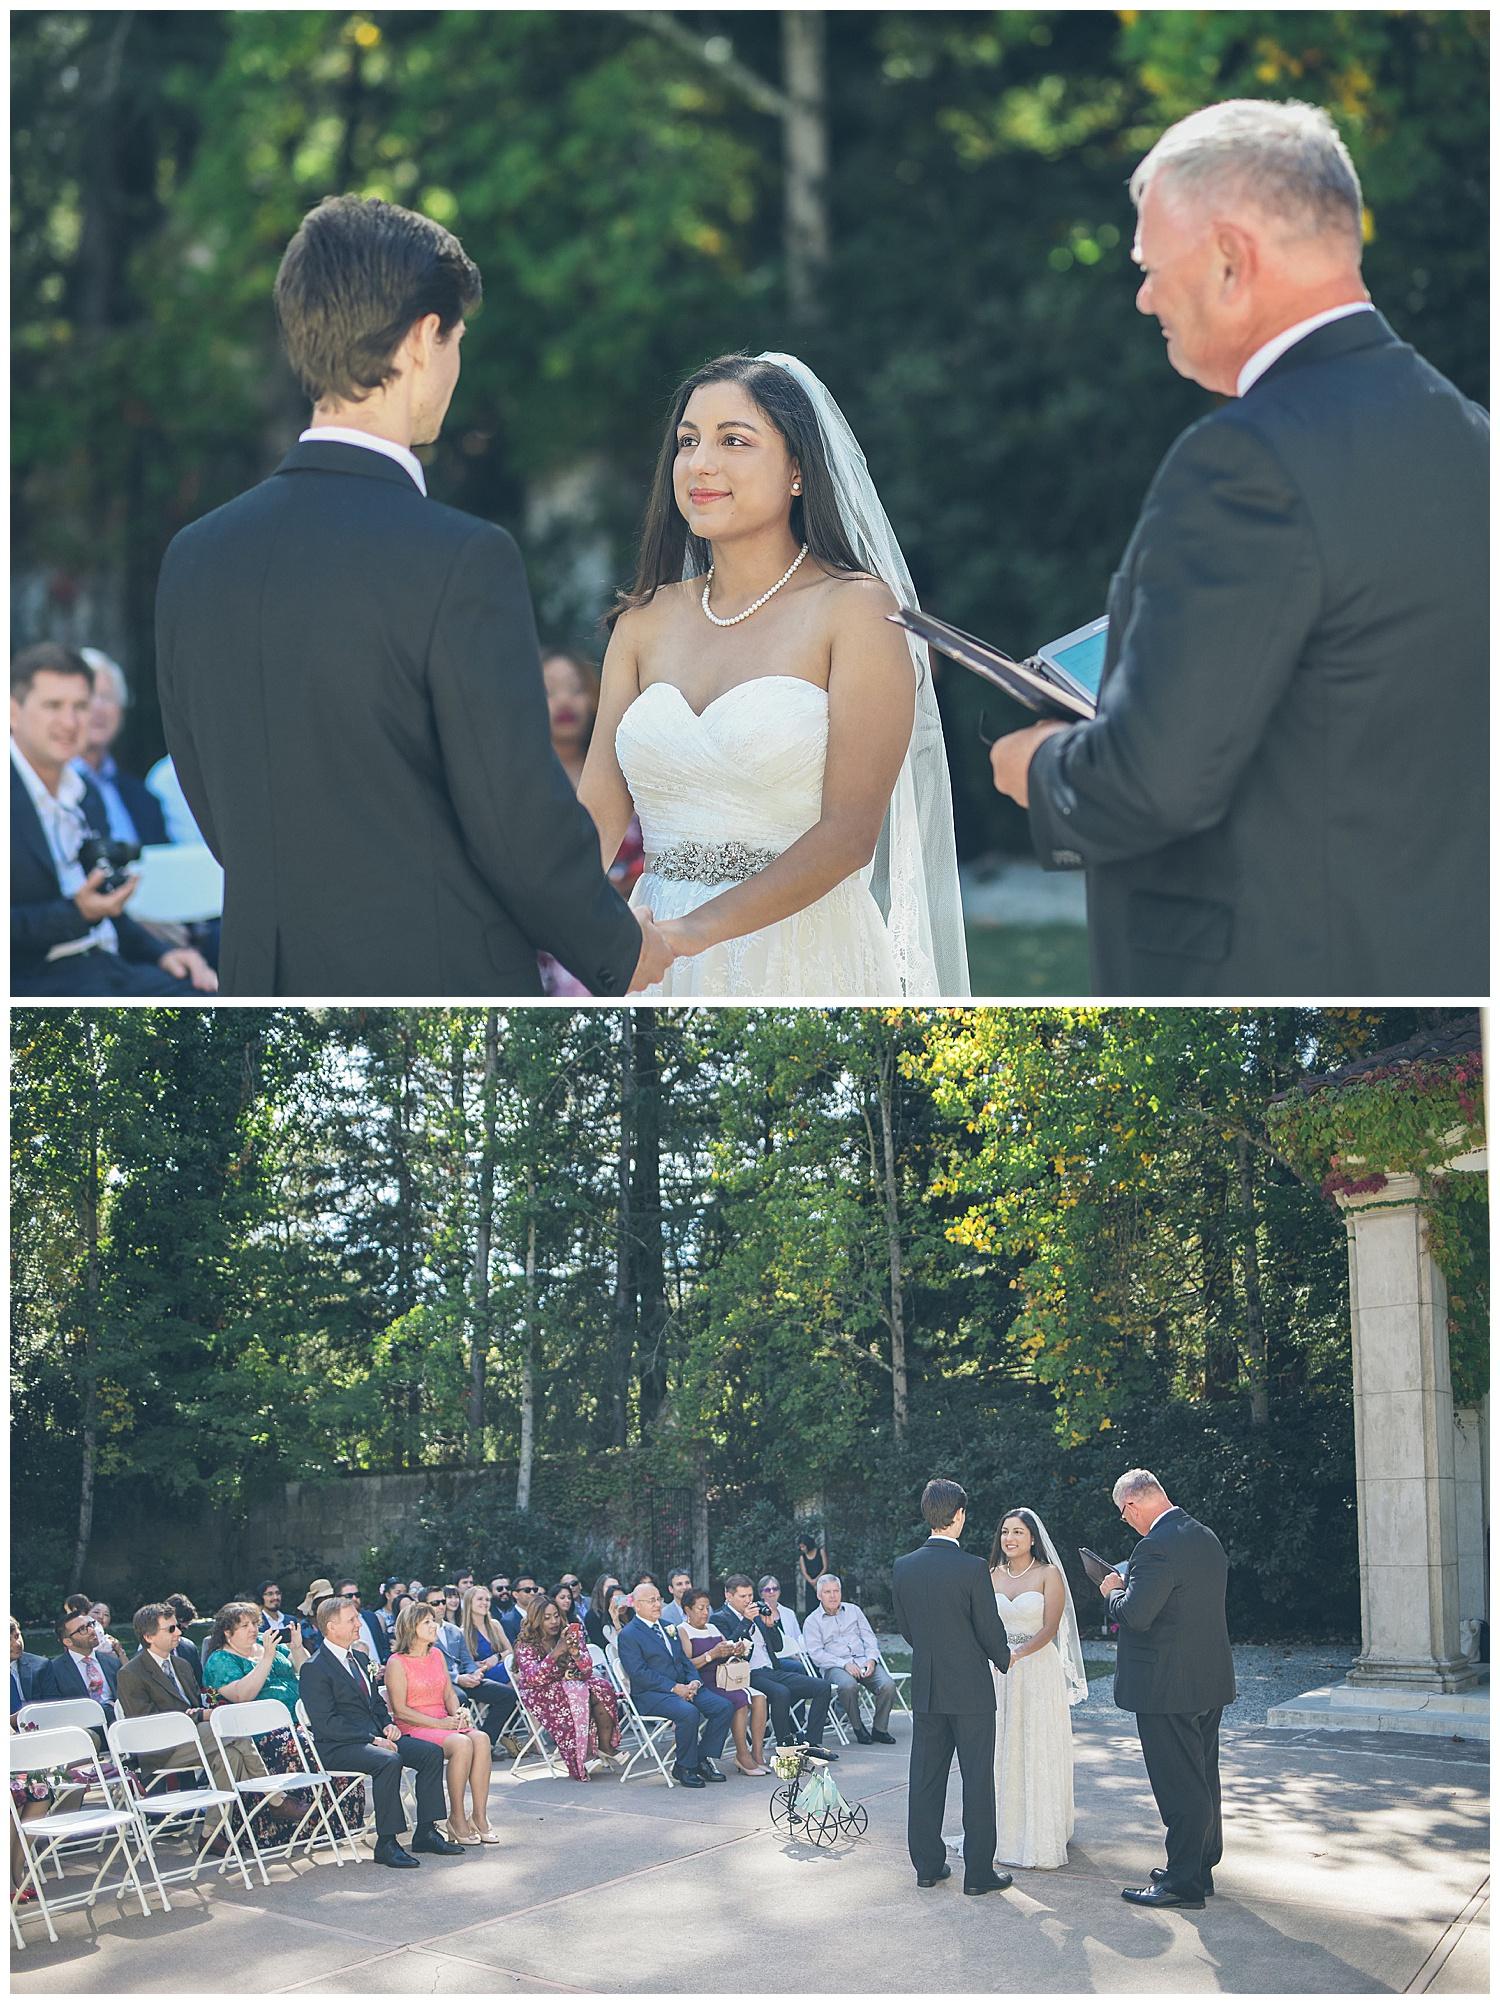 khariza-rae-photography-bay-area-wedding-photographer_0135.jpg